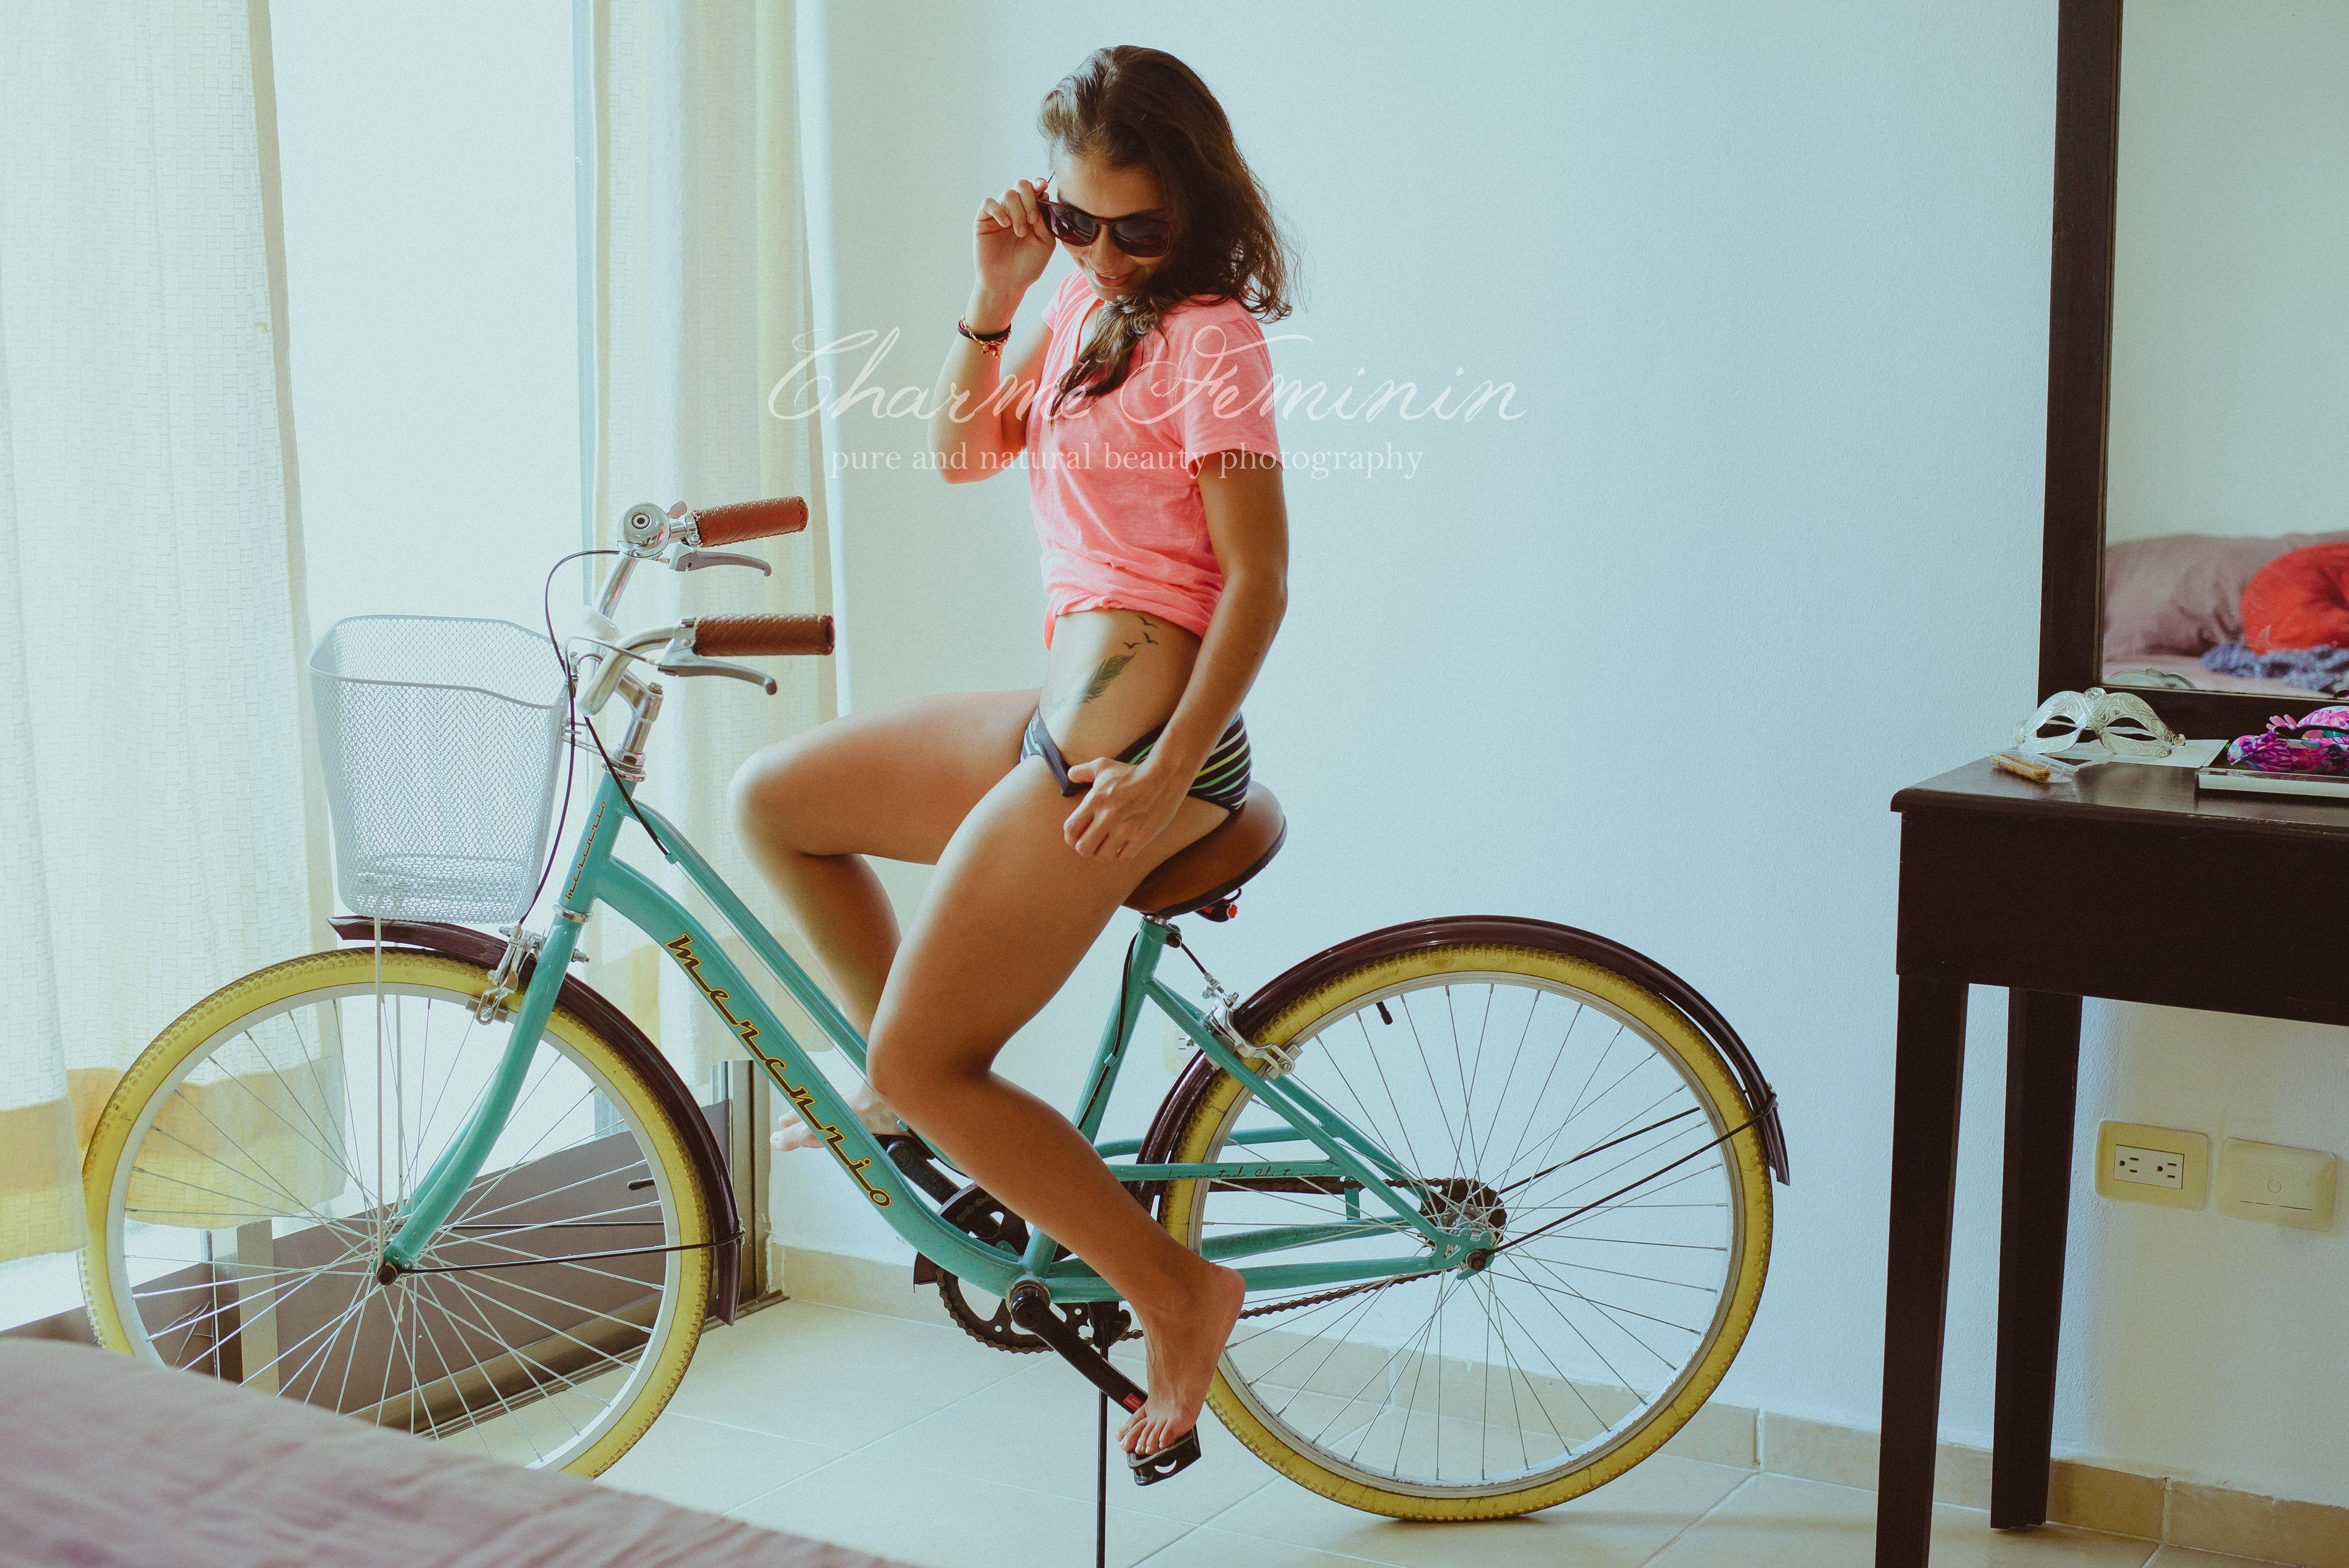 #charmefeminin  #boudoir #playadelcarmen #beauty #lady #photoshoot #photographs